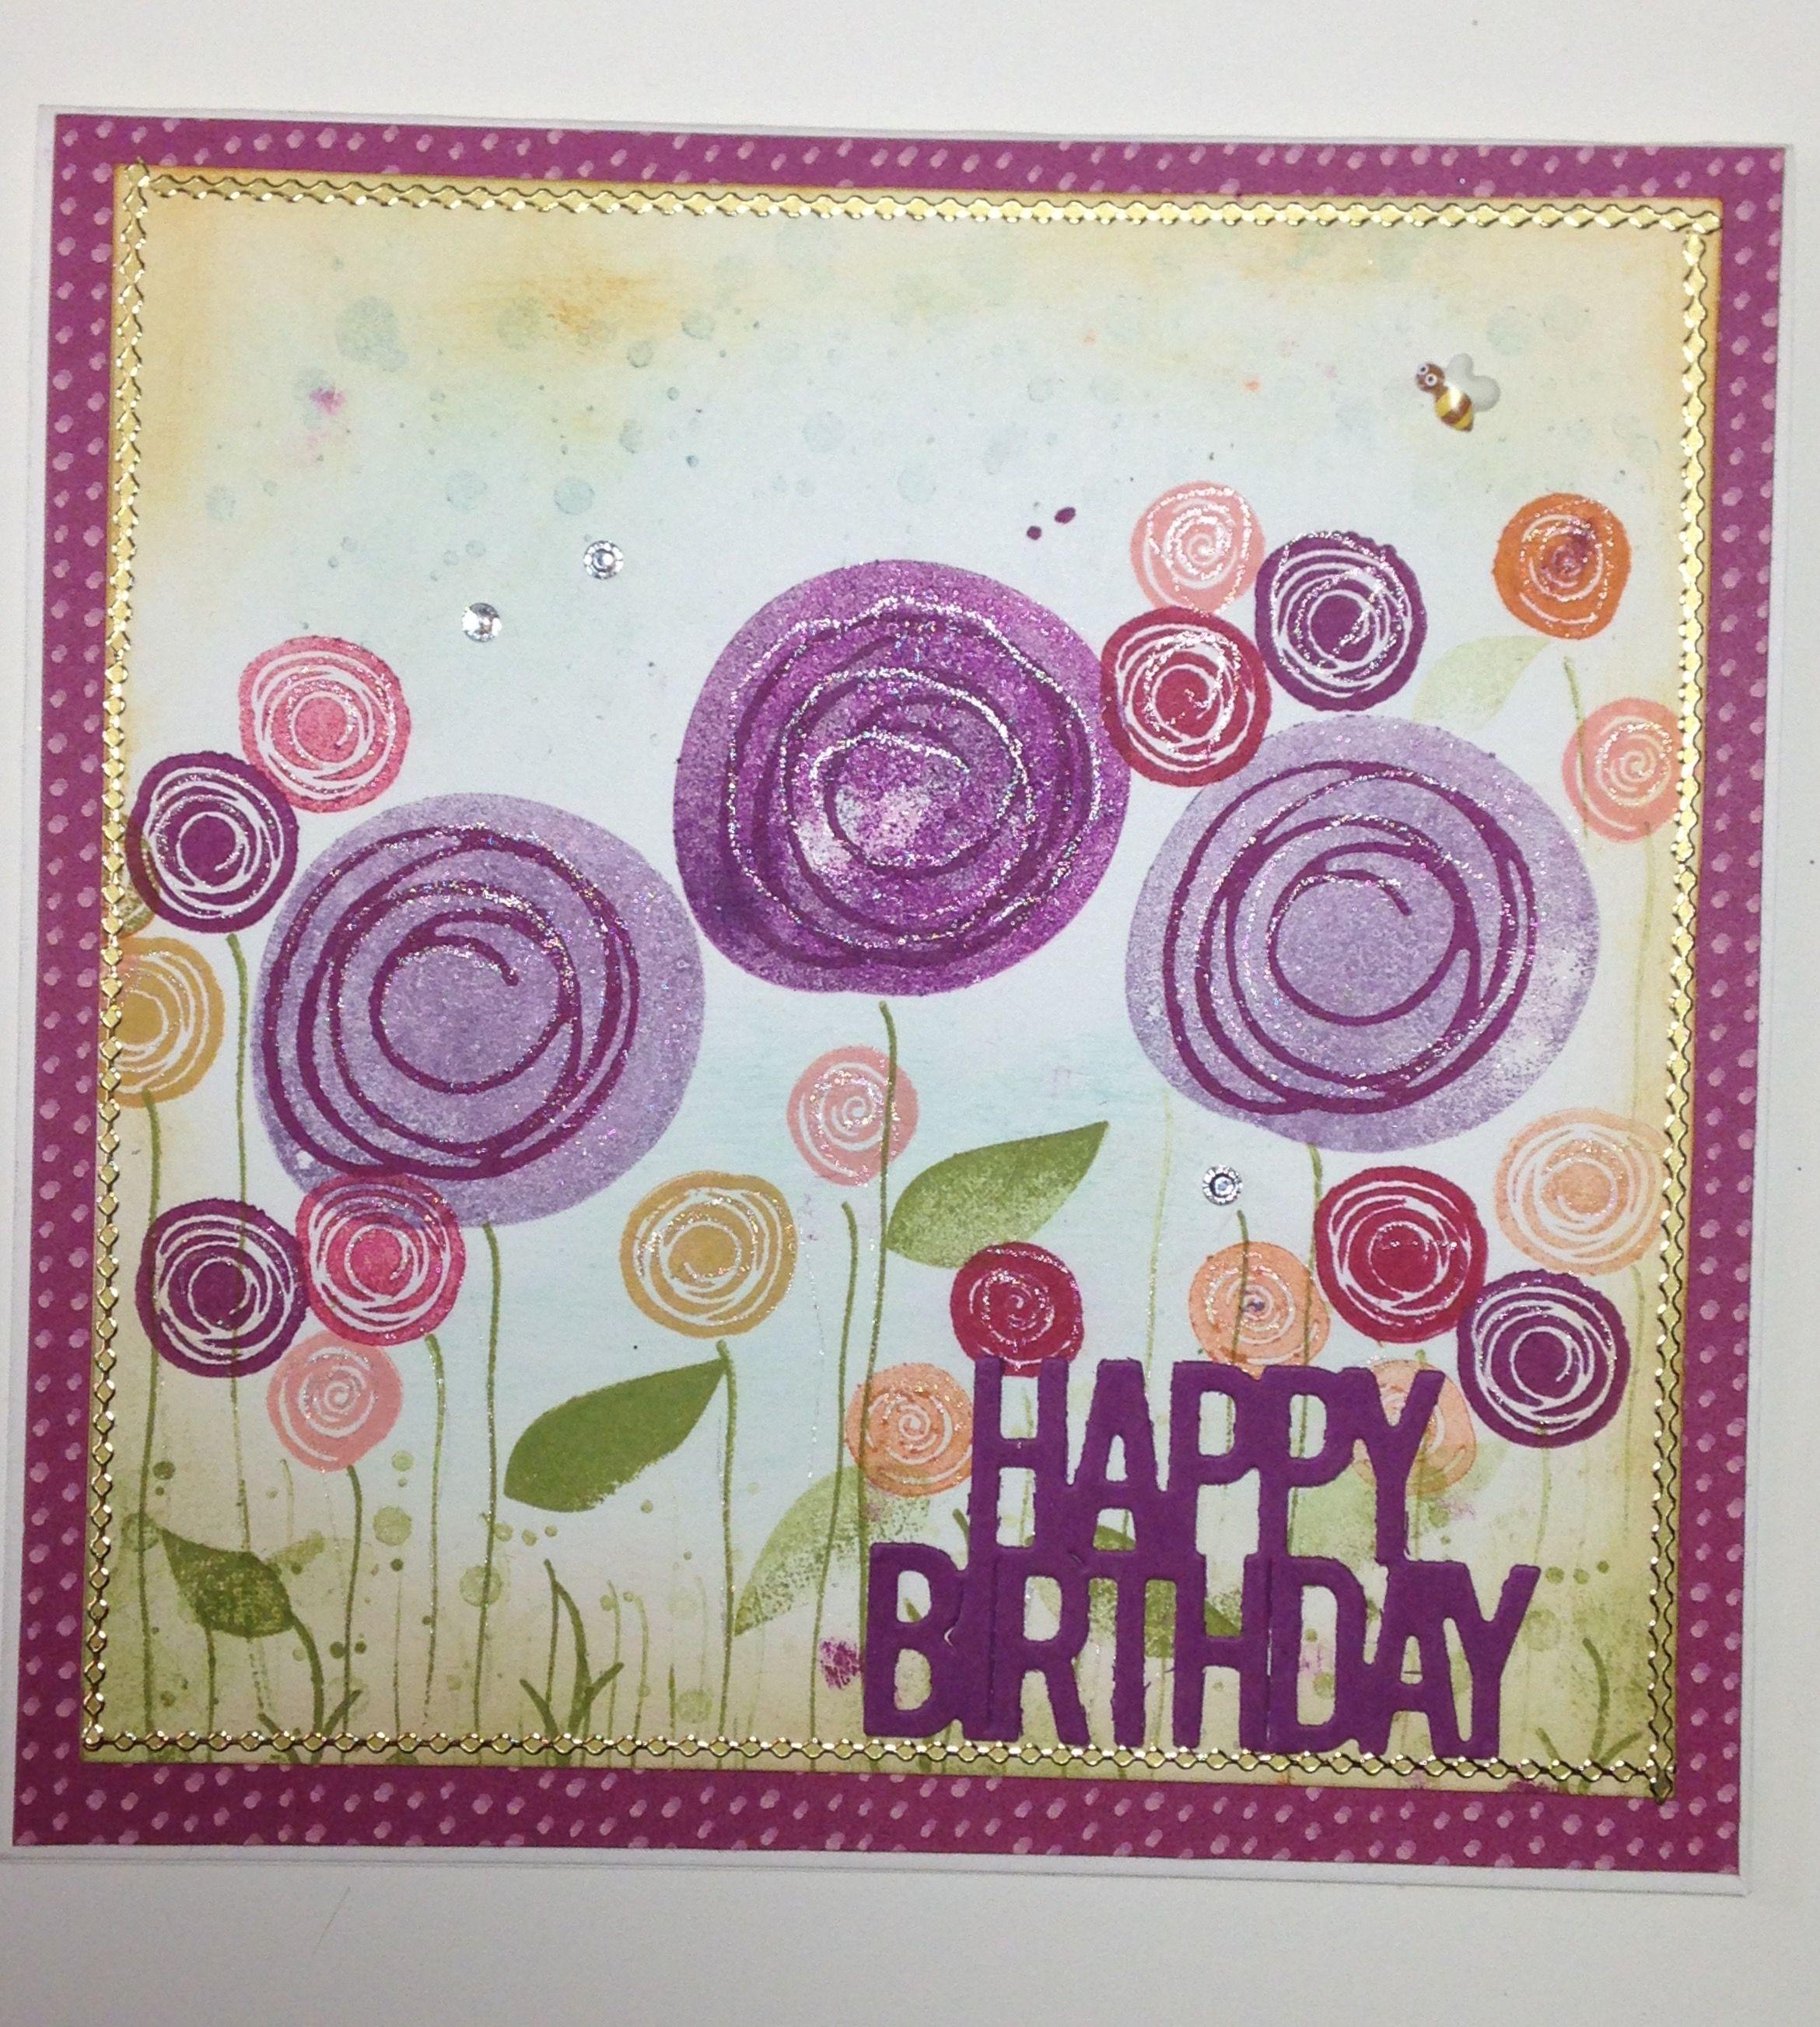 Stampin up swirly bird birthday card swirly birds pinterest